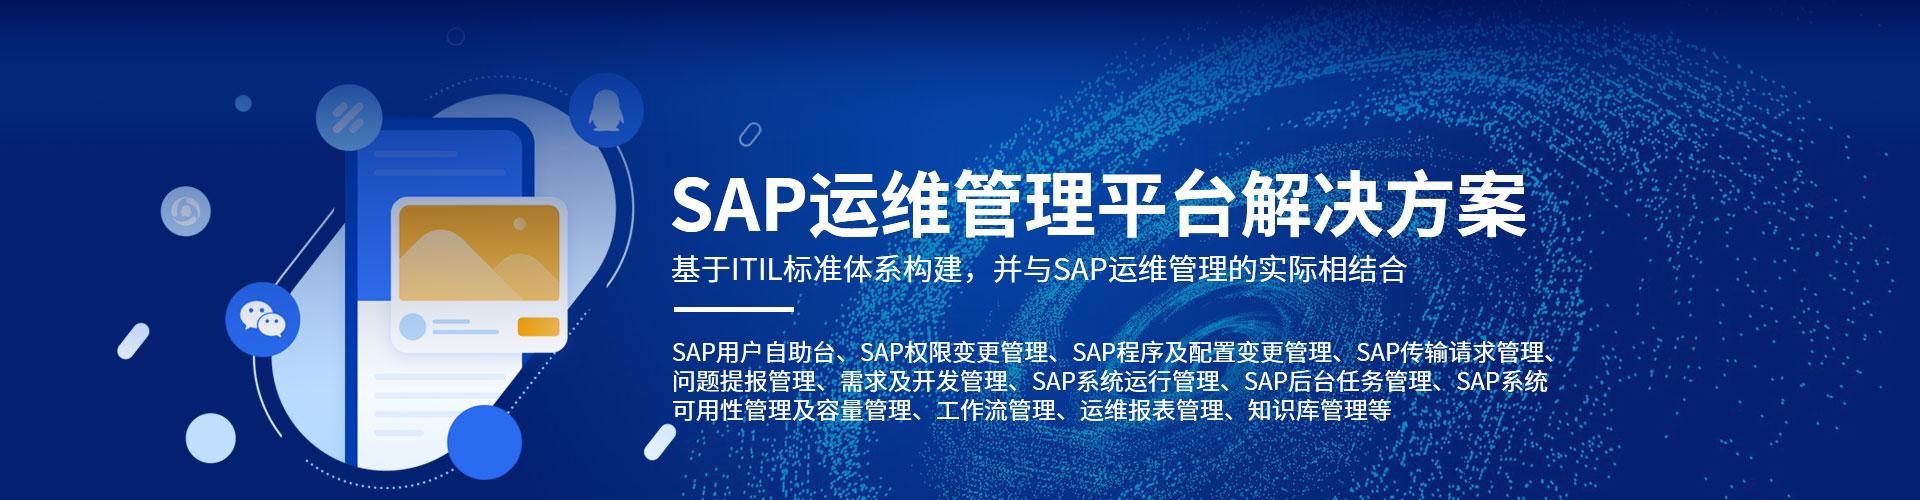 SAP运维管理平台解决方案